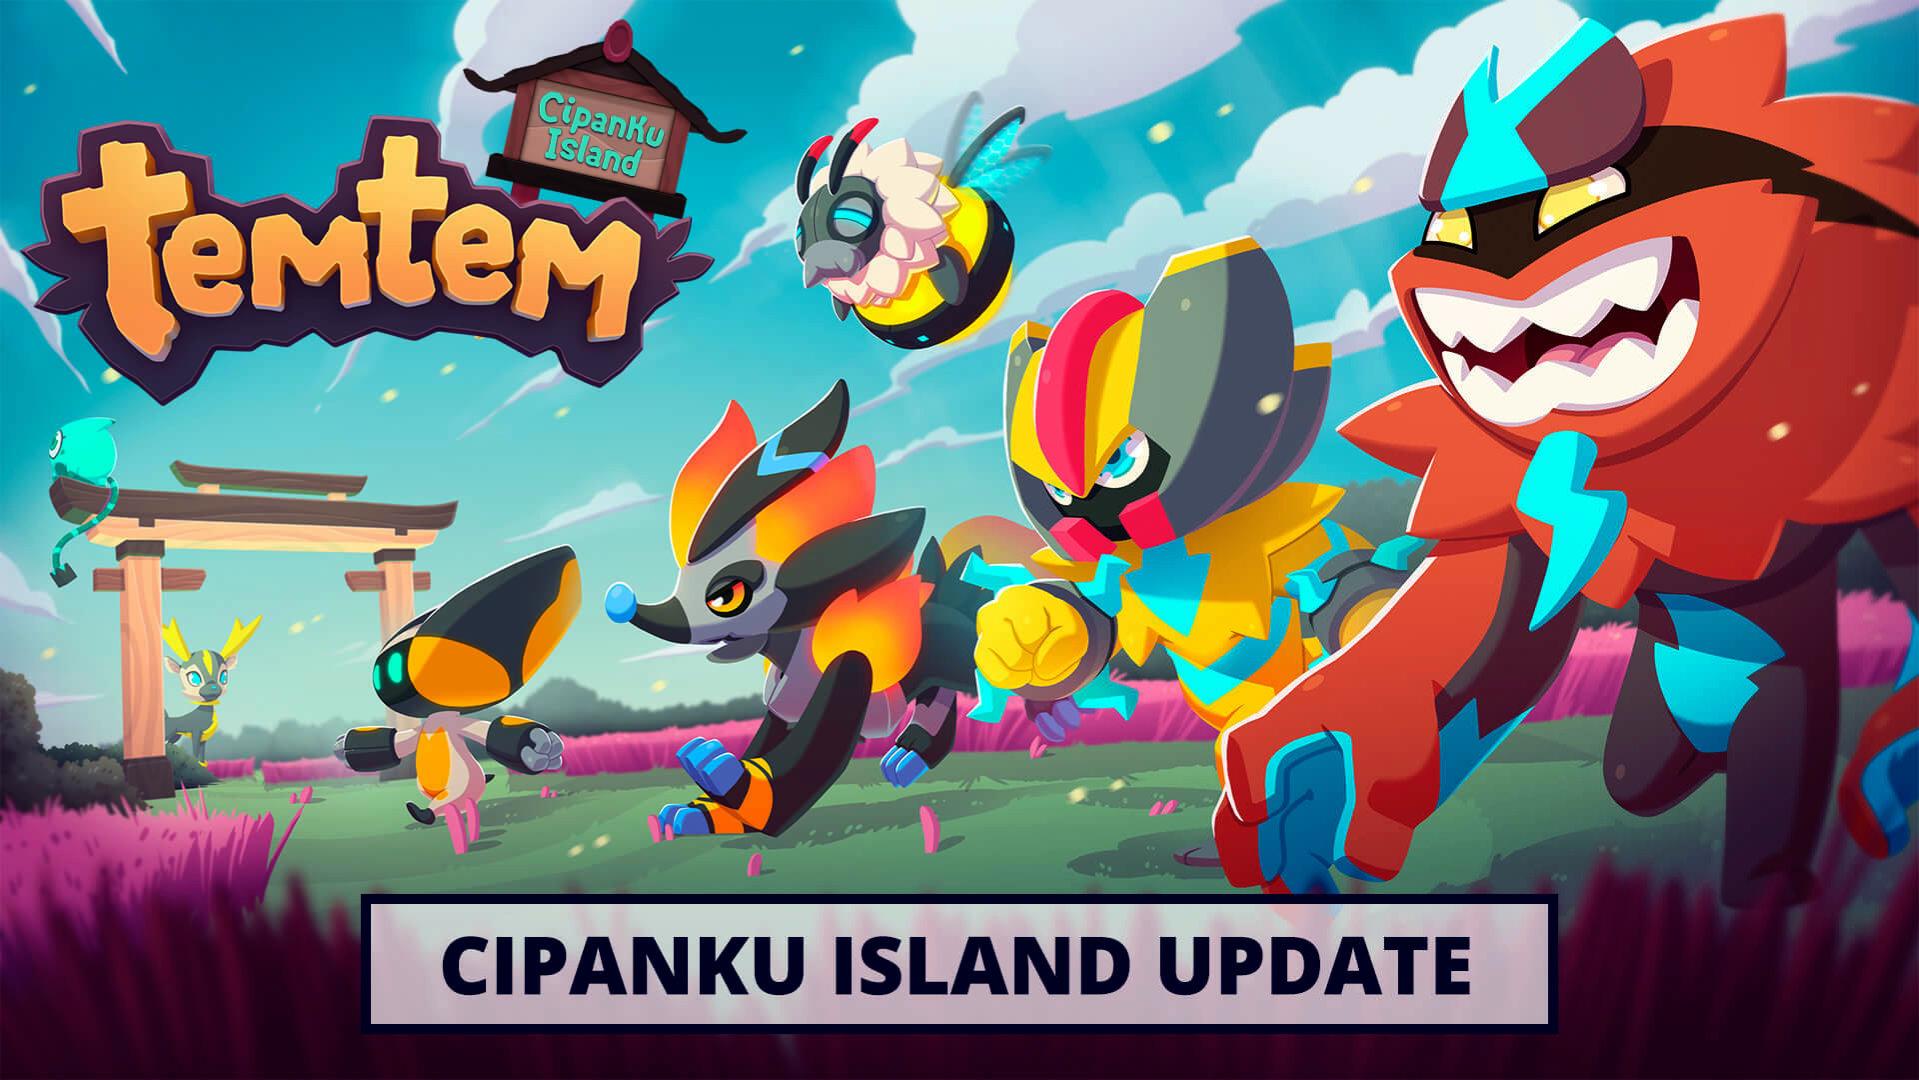 Temtem Cipanku Island Update